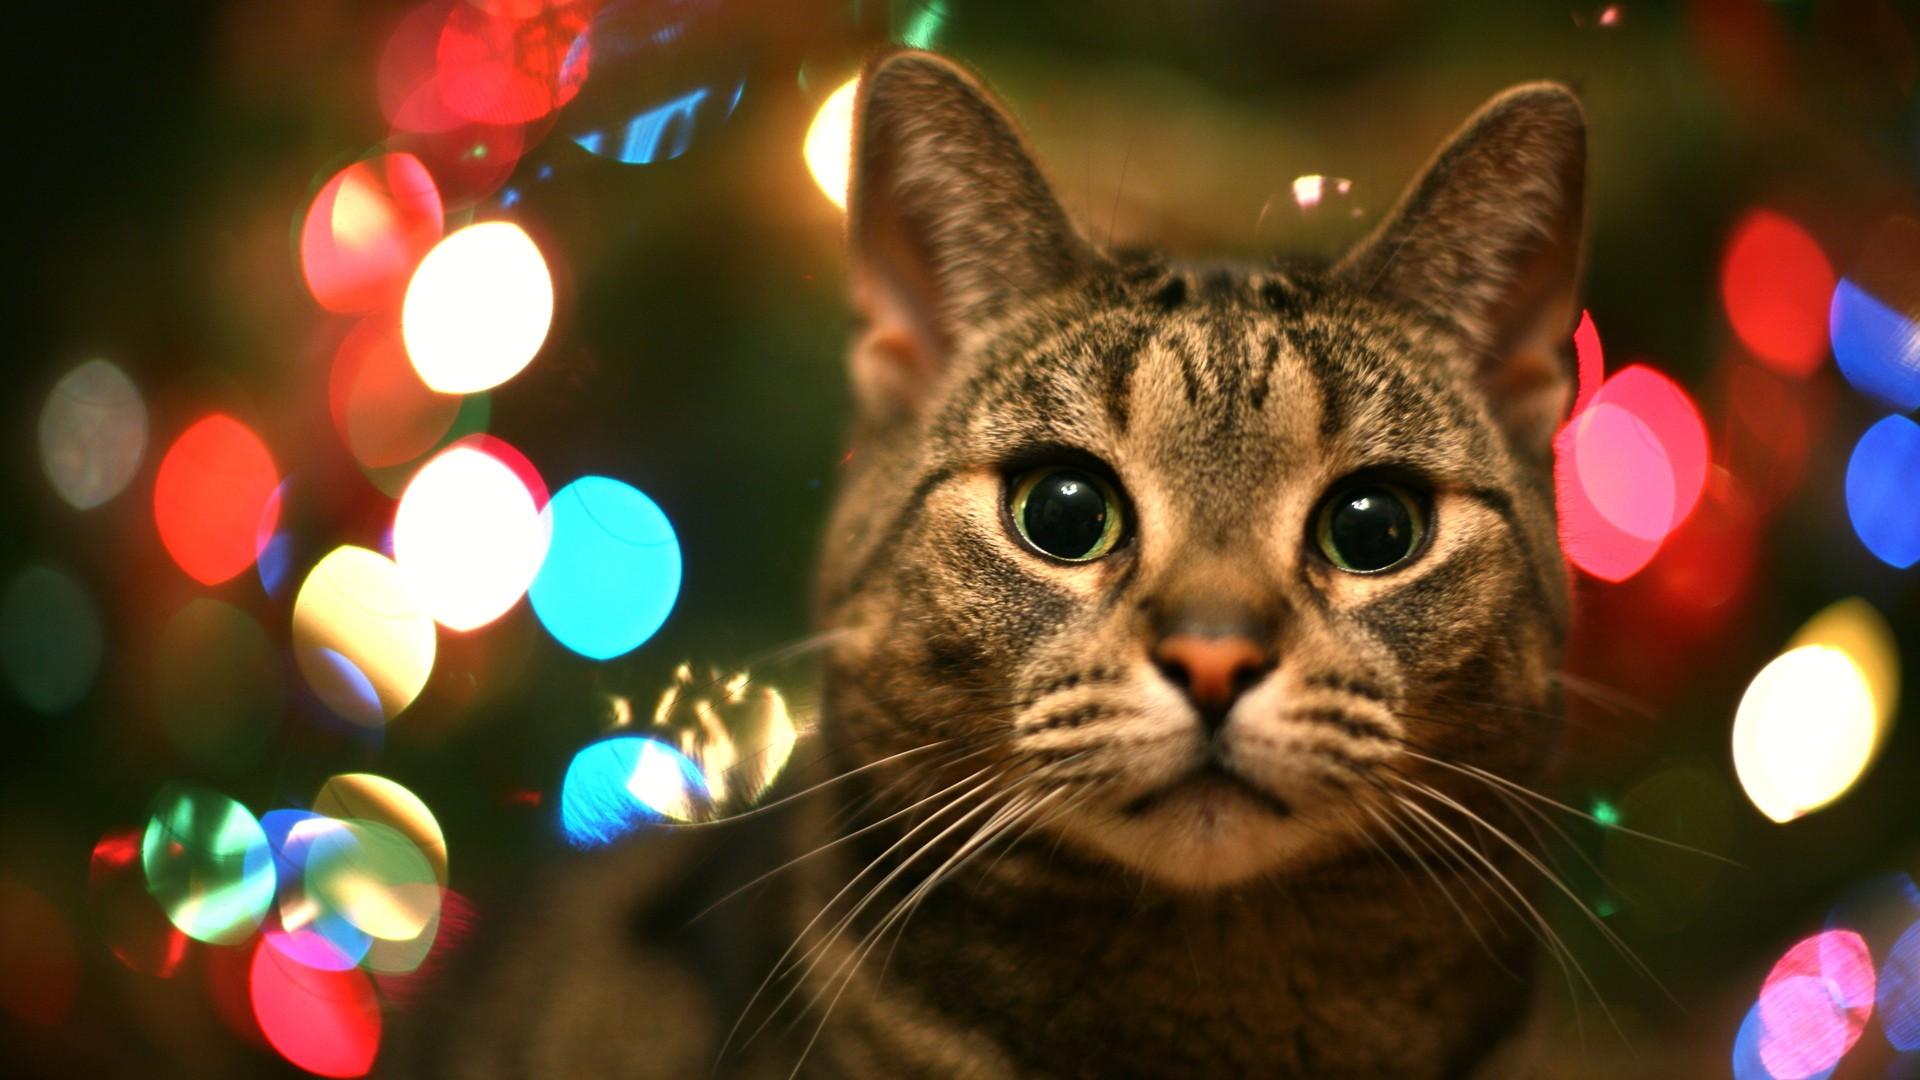 49+] Kitty Christmas Wallpaper for Desktop on WallpaperSafari